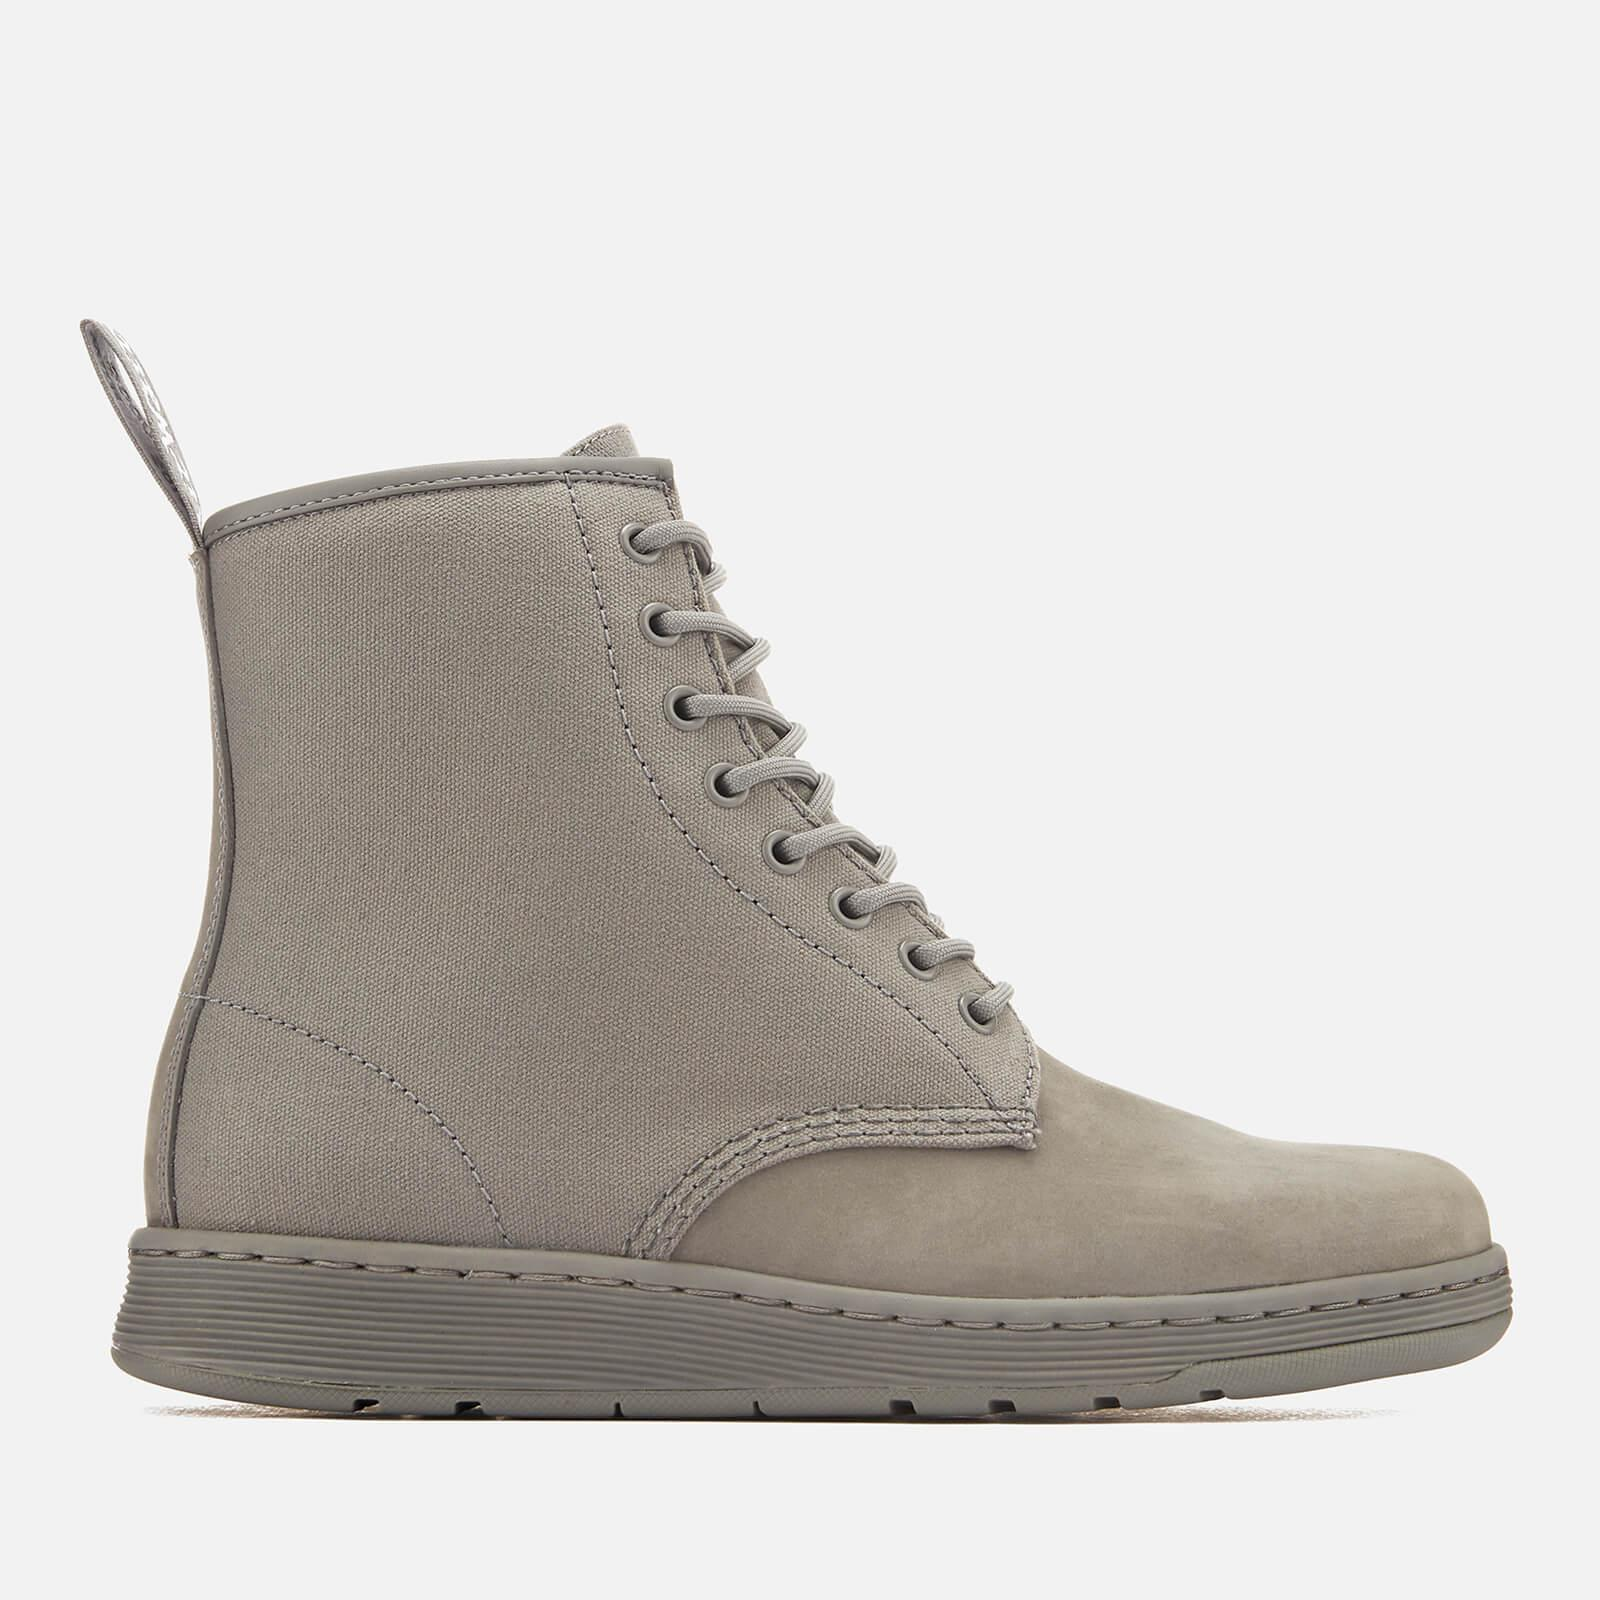 Dr Martens Lite 8-Eye Boots In Beige outlet comfortable sale visit best store to get sale online RGTZ7